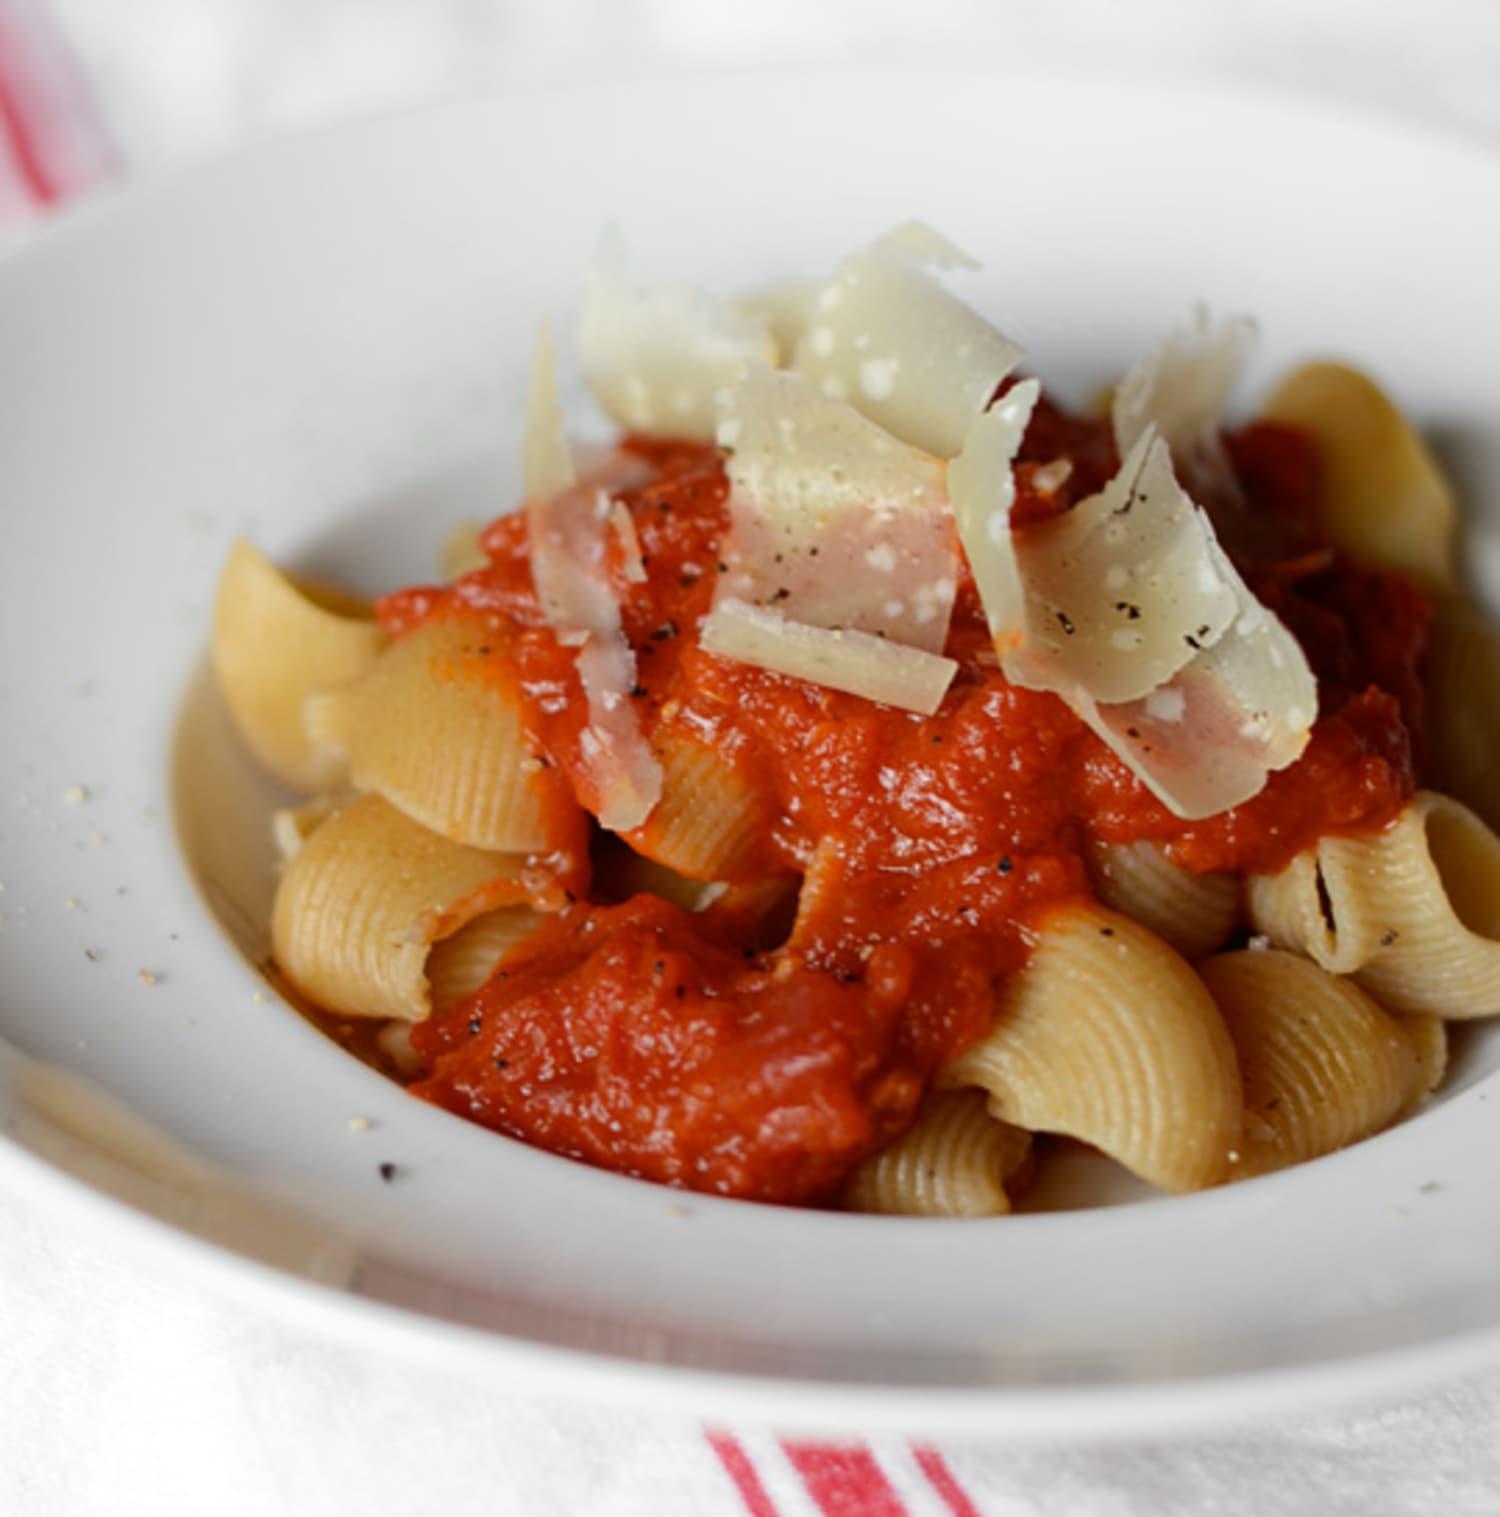 Marcella Hazan's Amazing 4-Ingredient Tomato Sauce